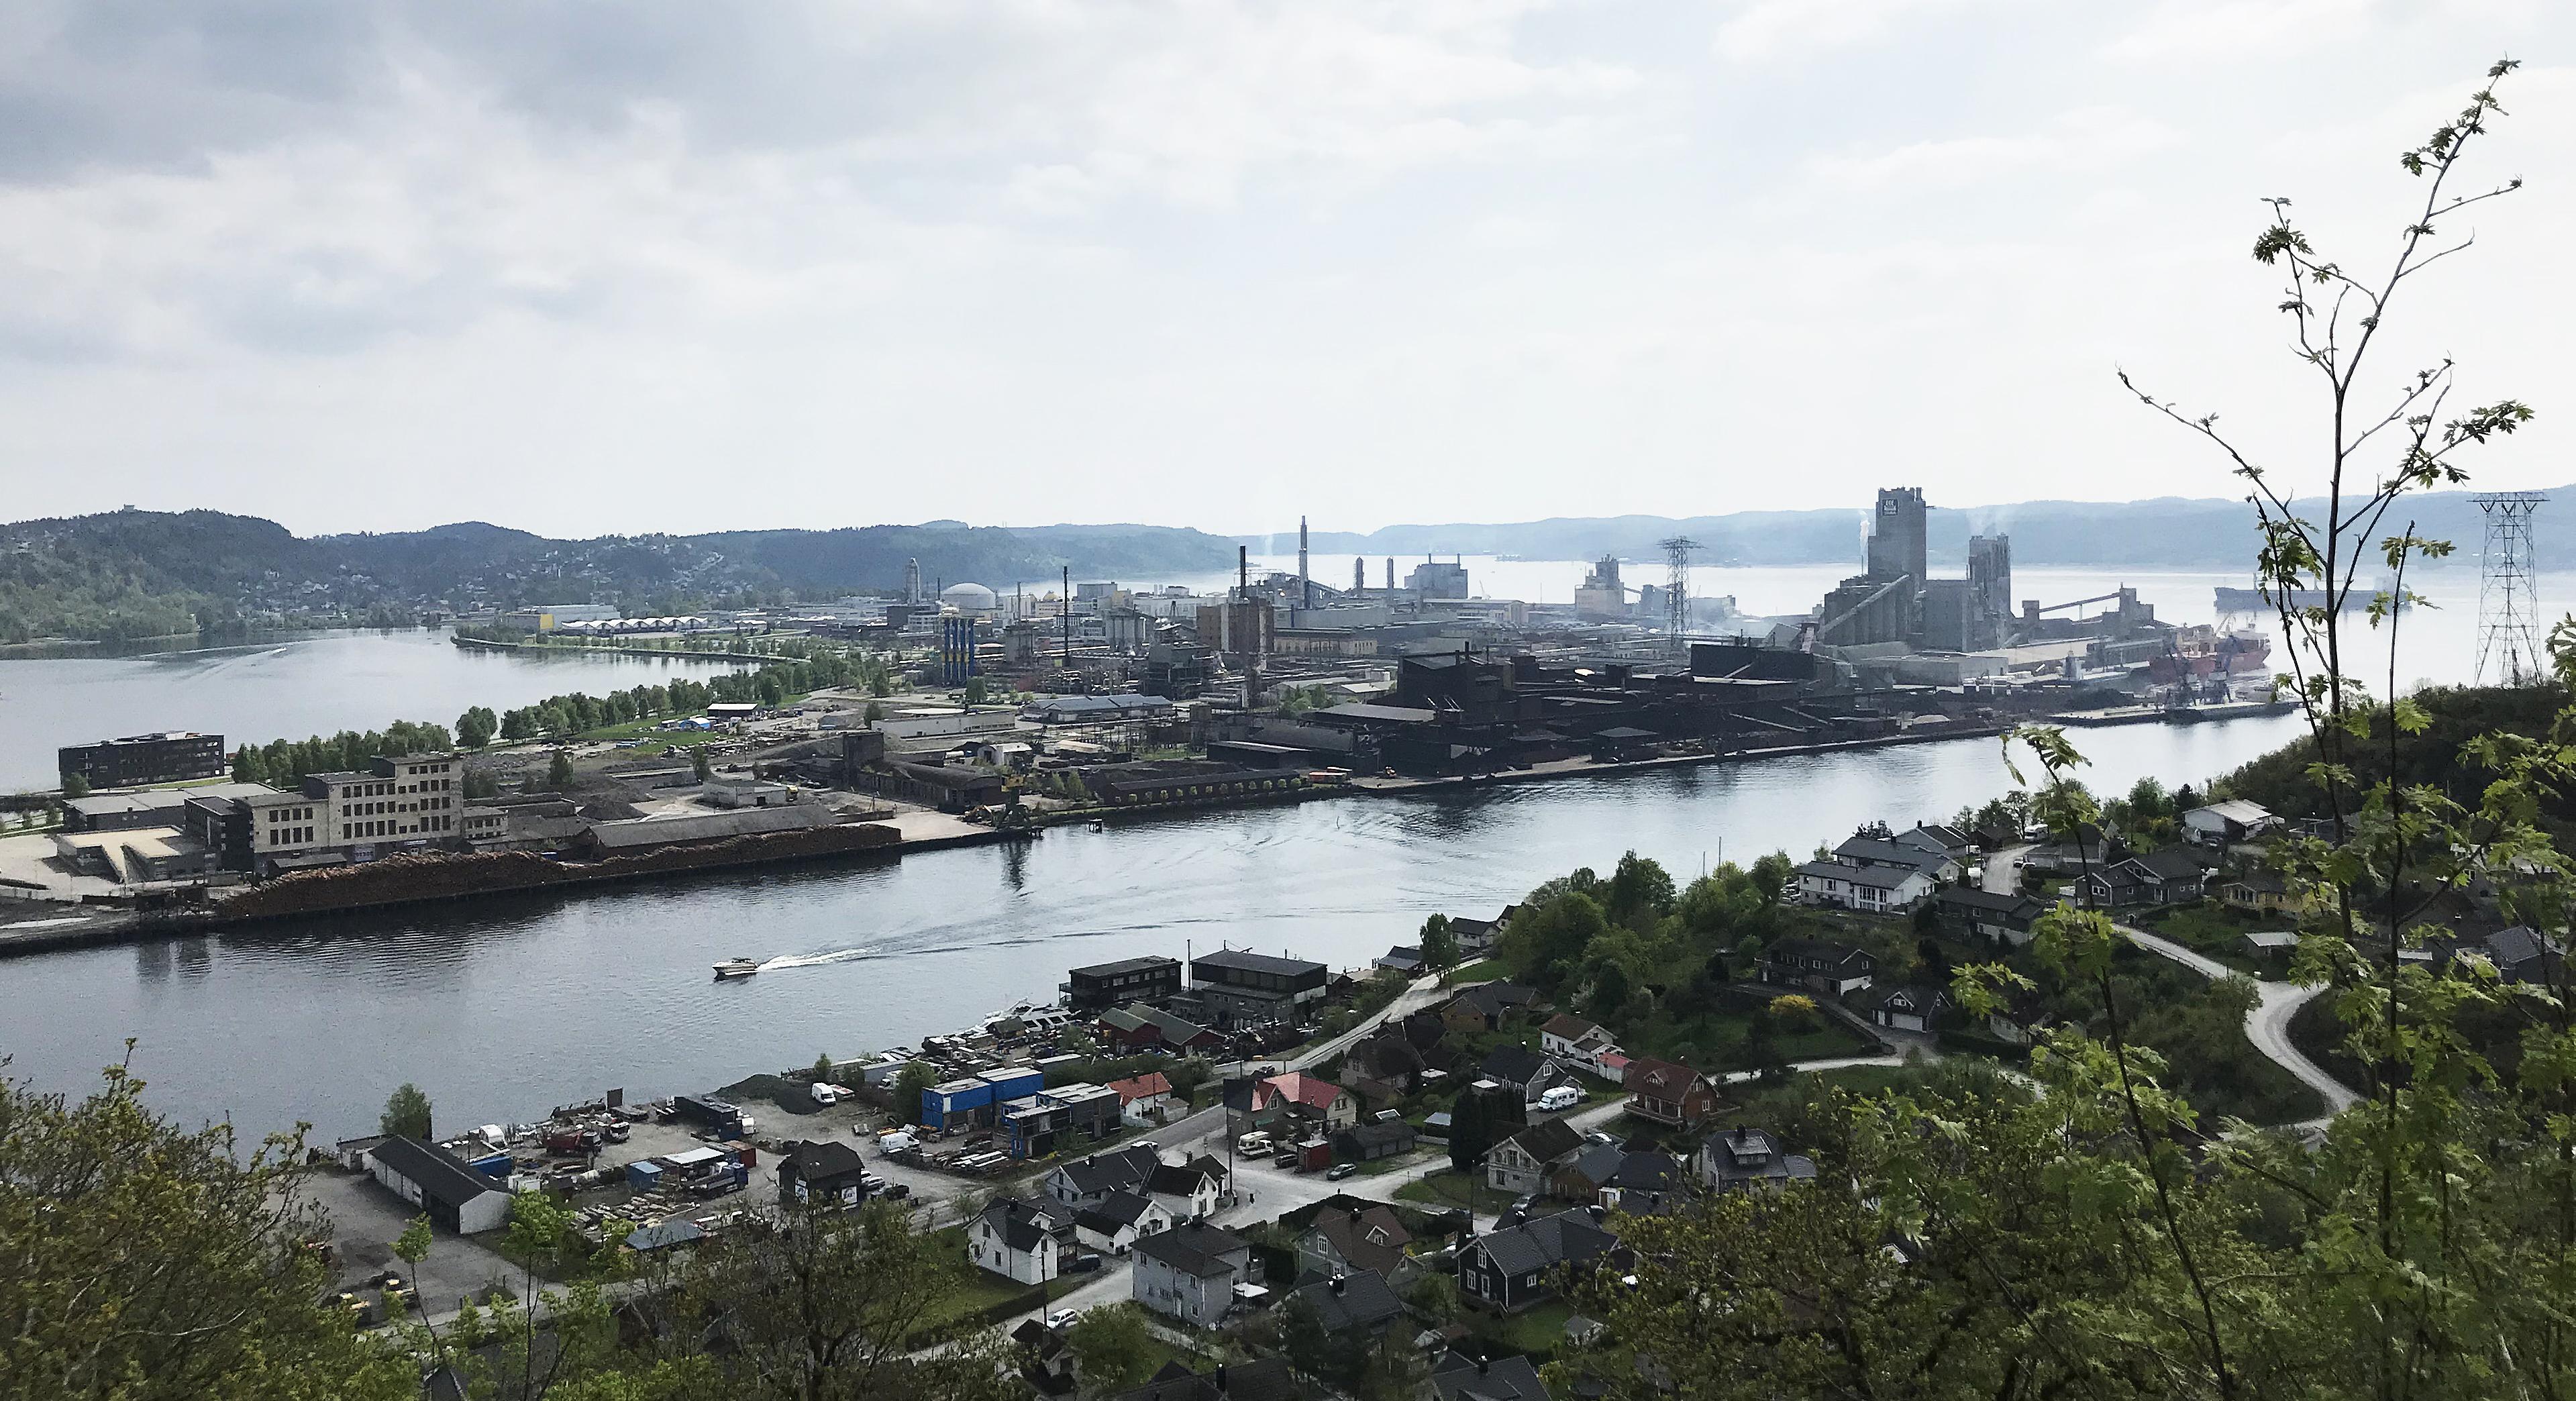 Herøya Industripark Oversikt2